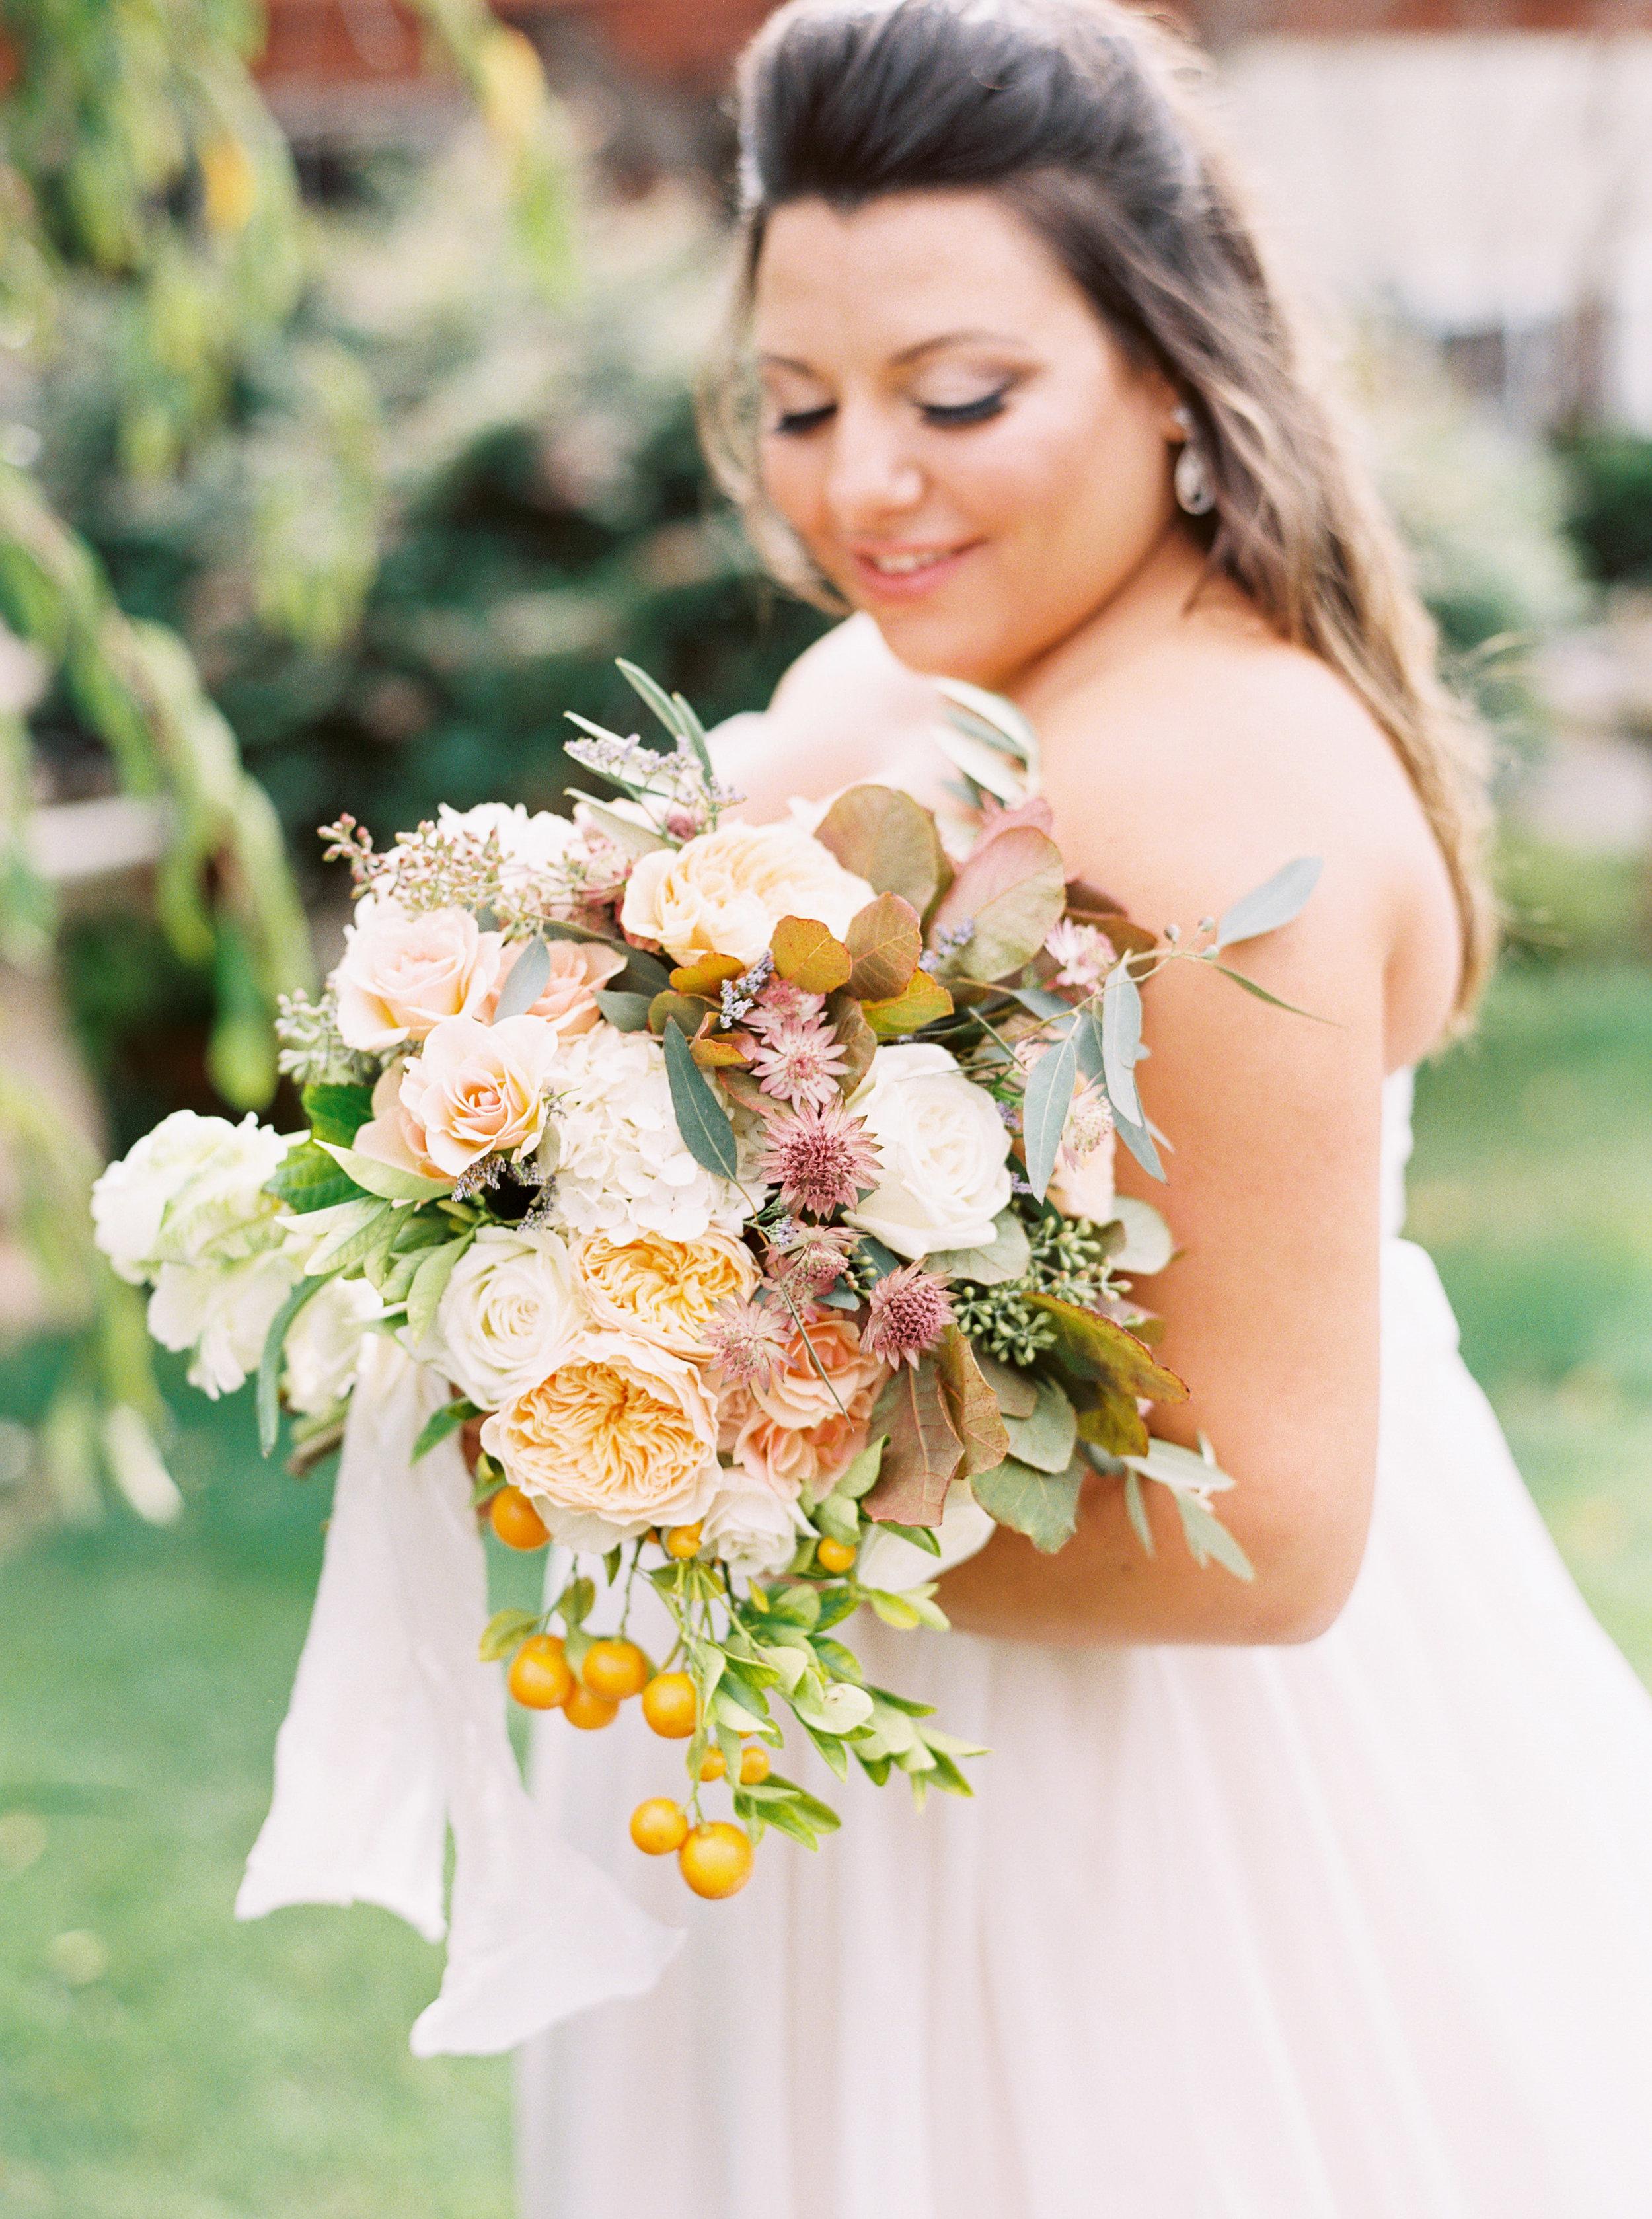 airport-hanger-wedding-in-livermore-california-1-2.jpg